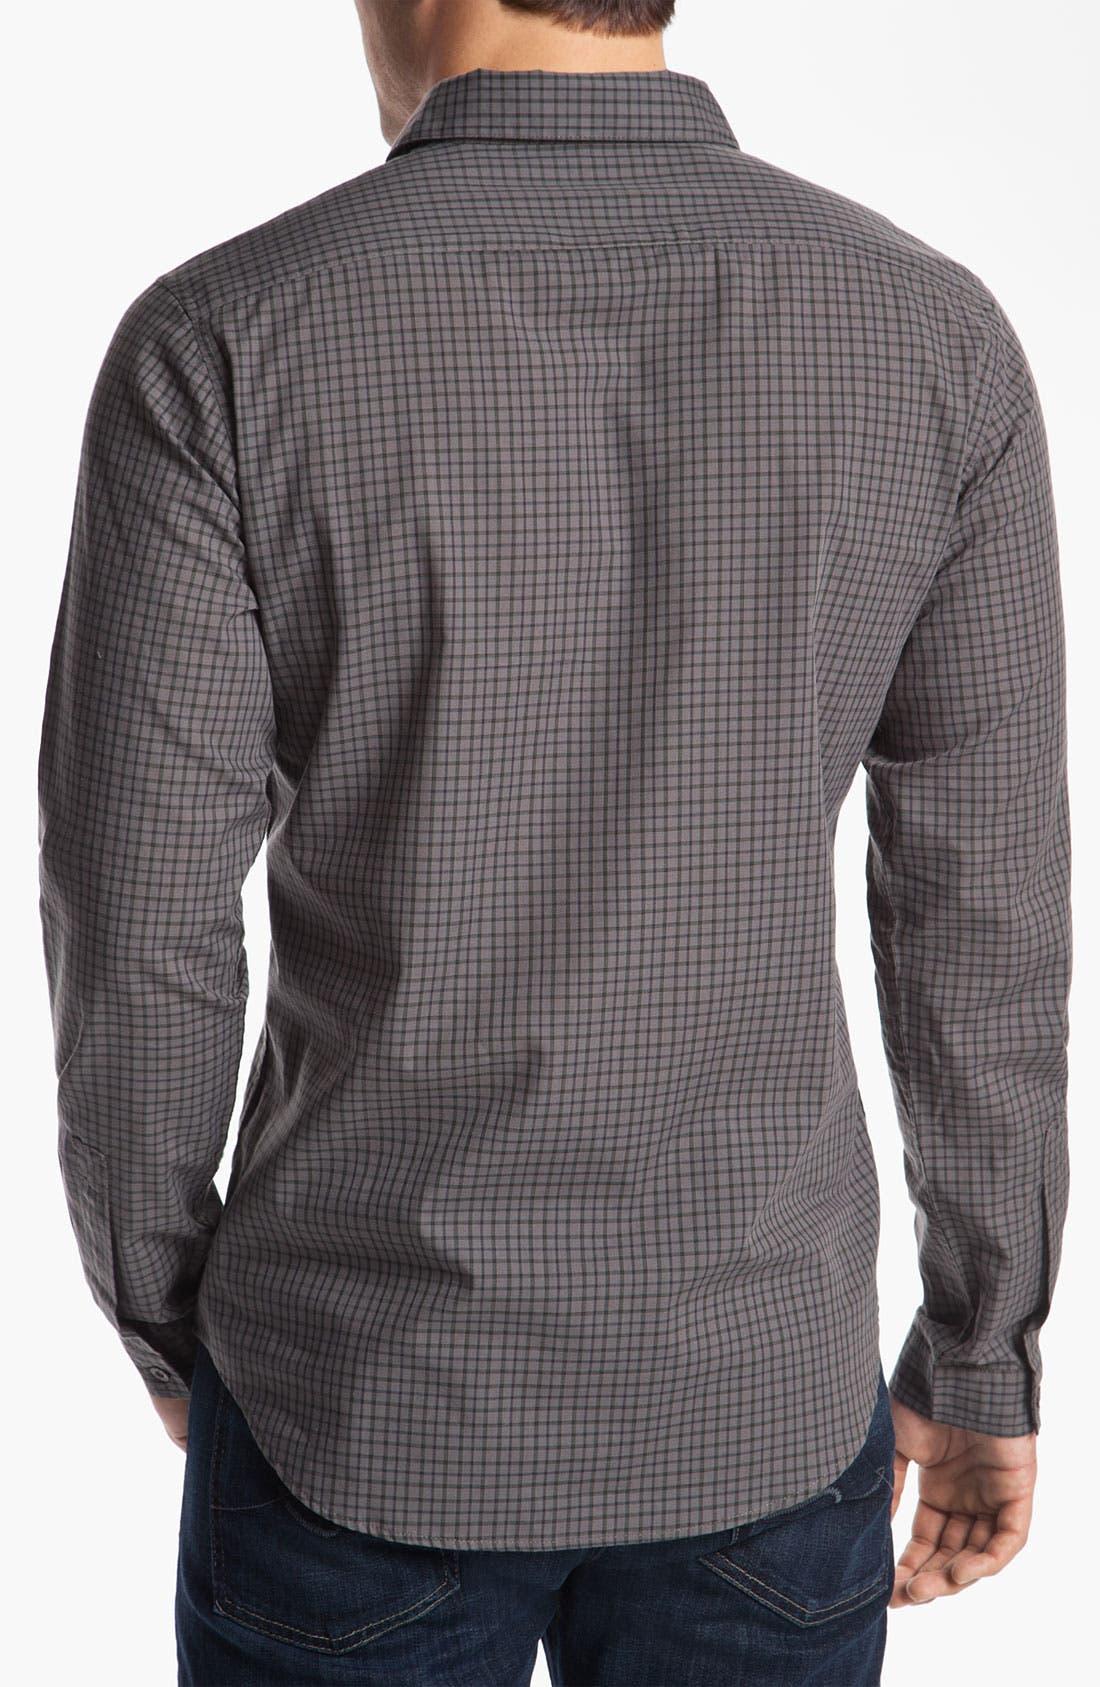 Alternate Image 2  - RVCA 'Borealis' Check Woven Shirt